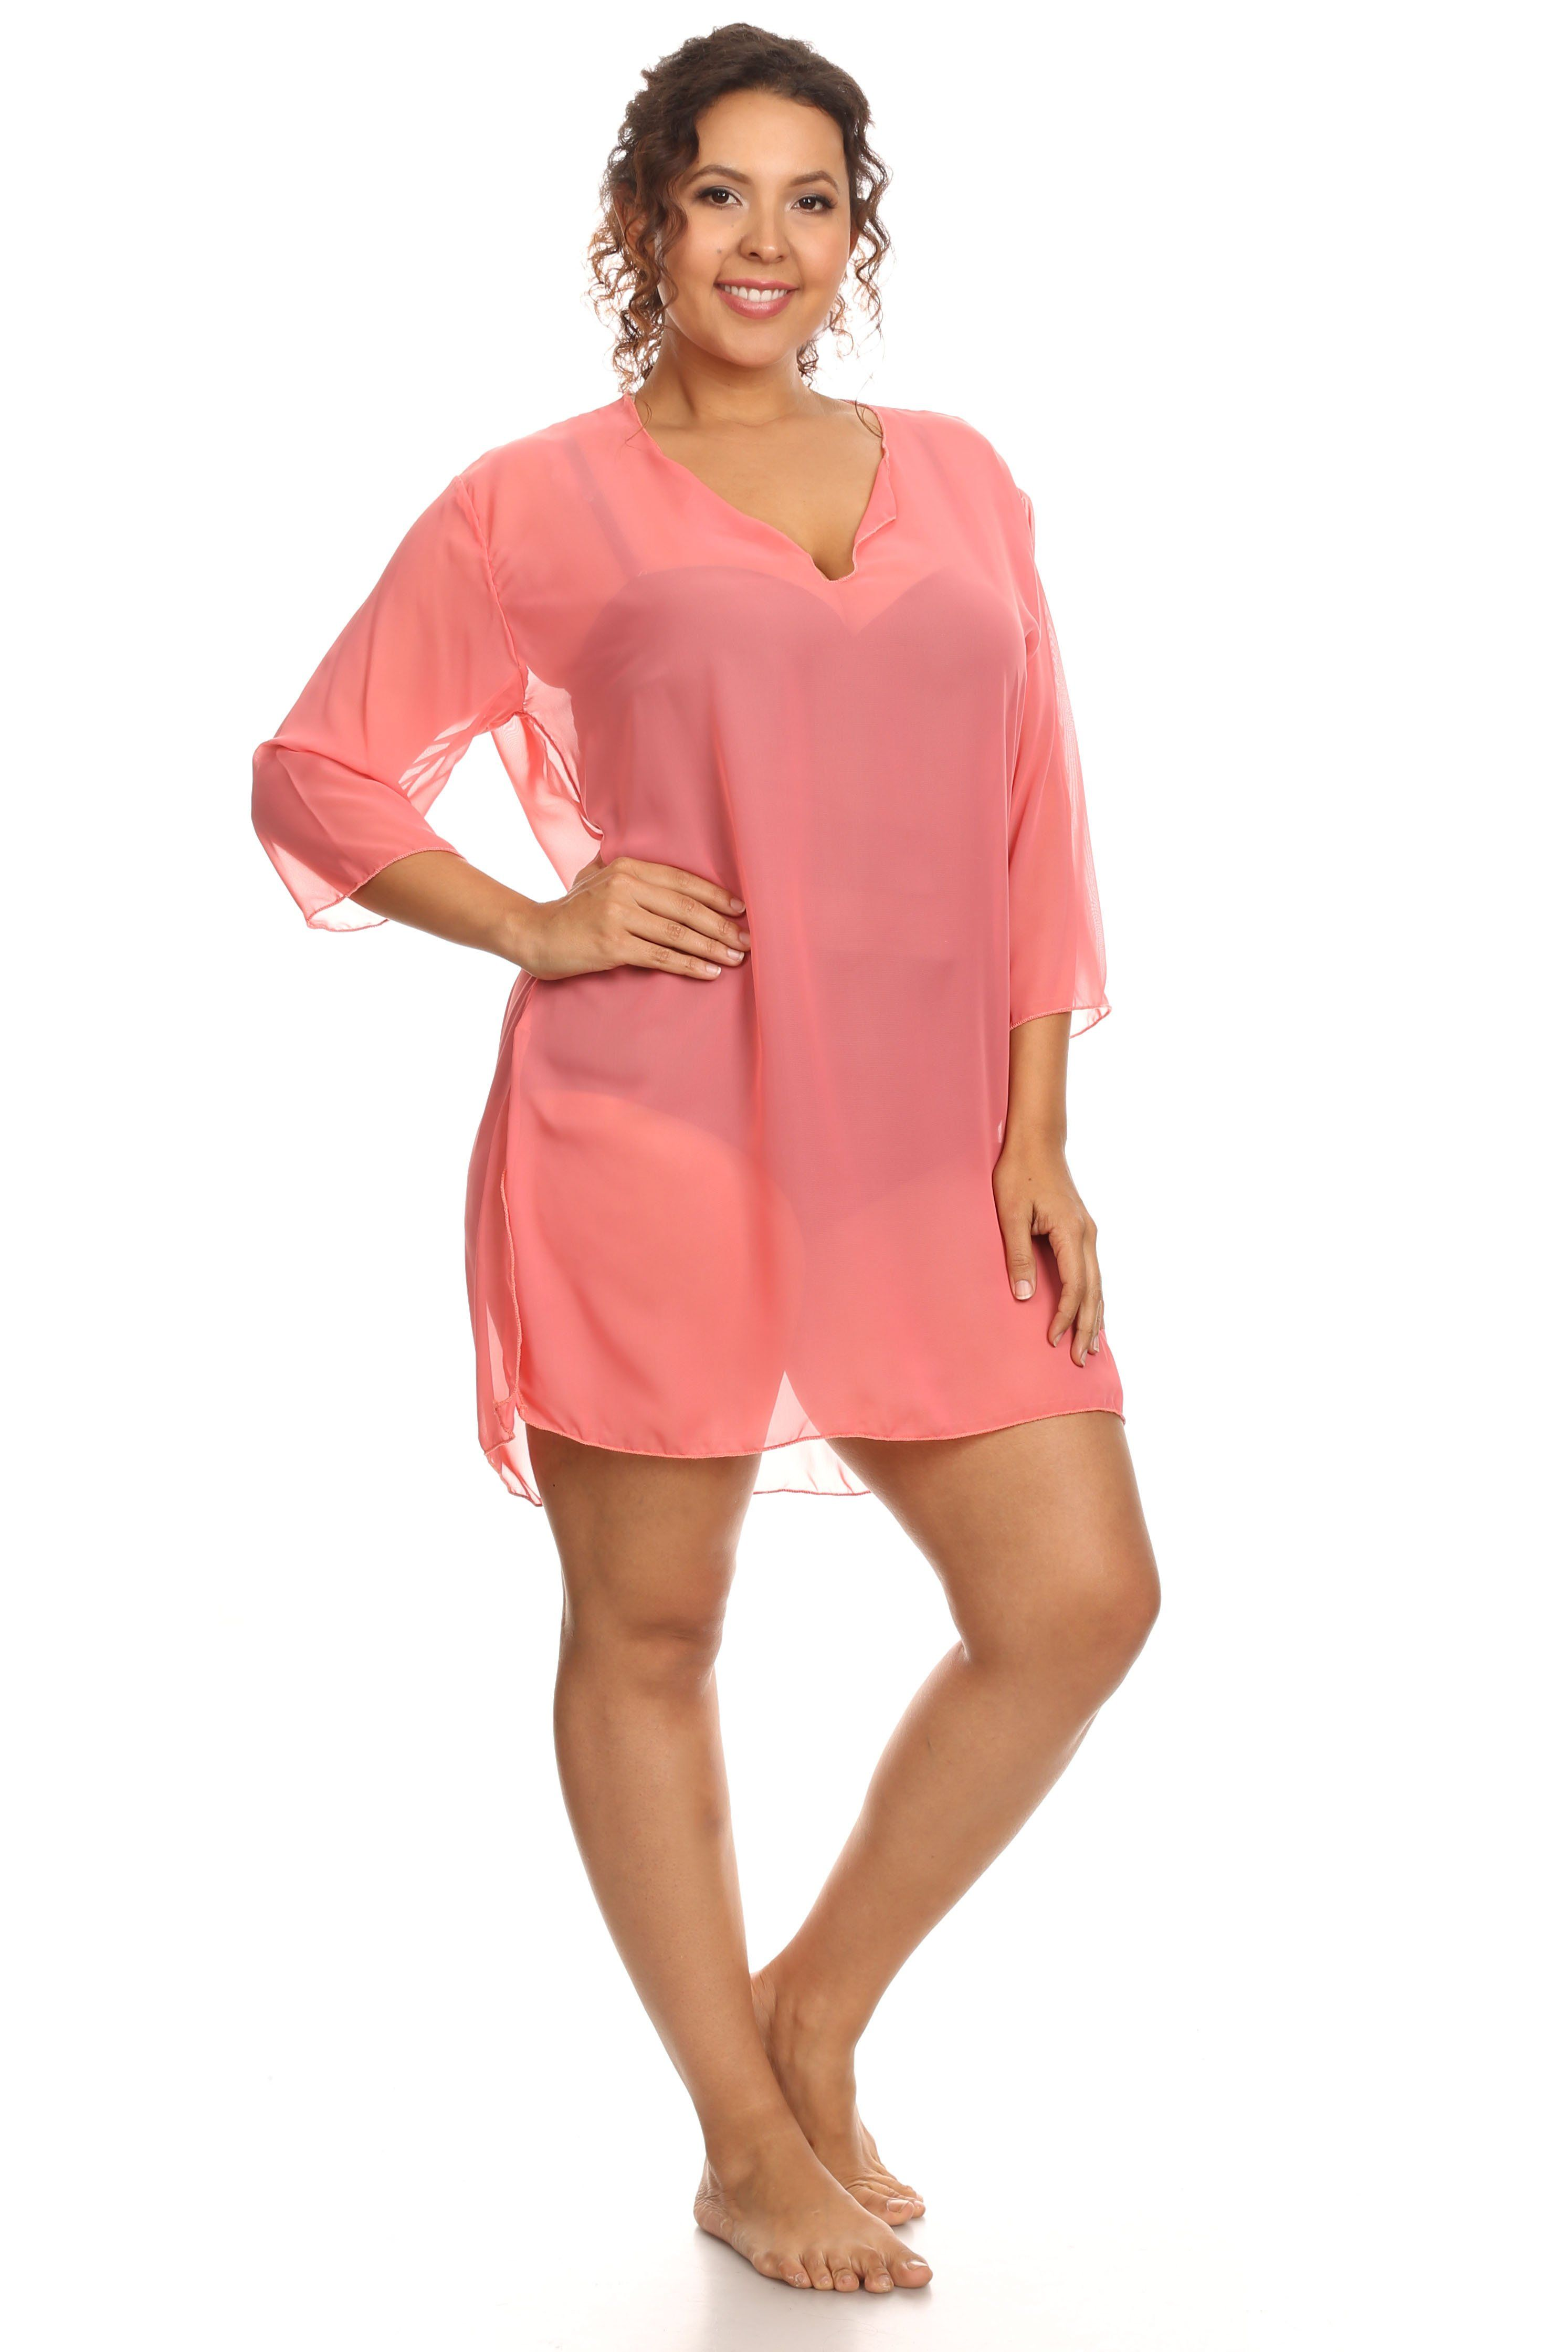 a3457902e7 Plus Size Chiffon Long Sleeve Swimwear Cover-up Beach Dress Made in th -  SHORETRENDZ